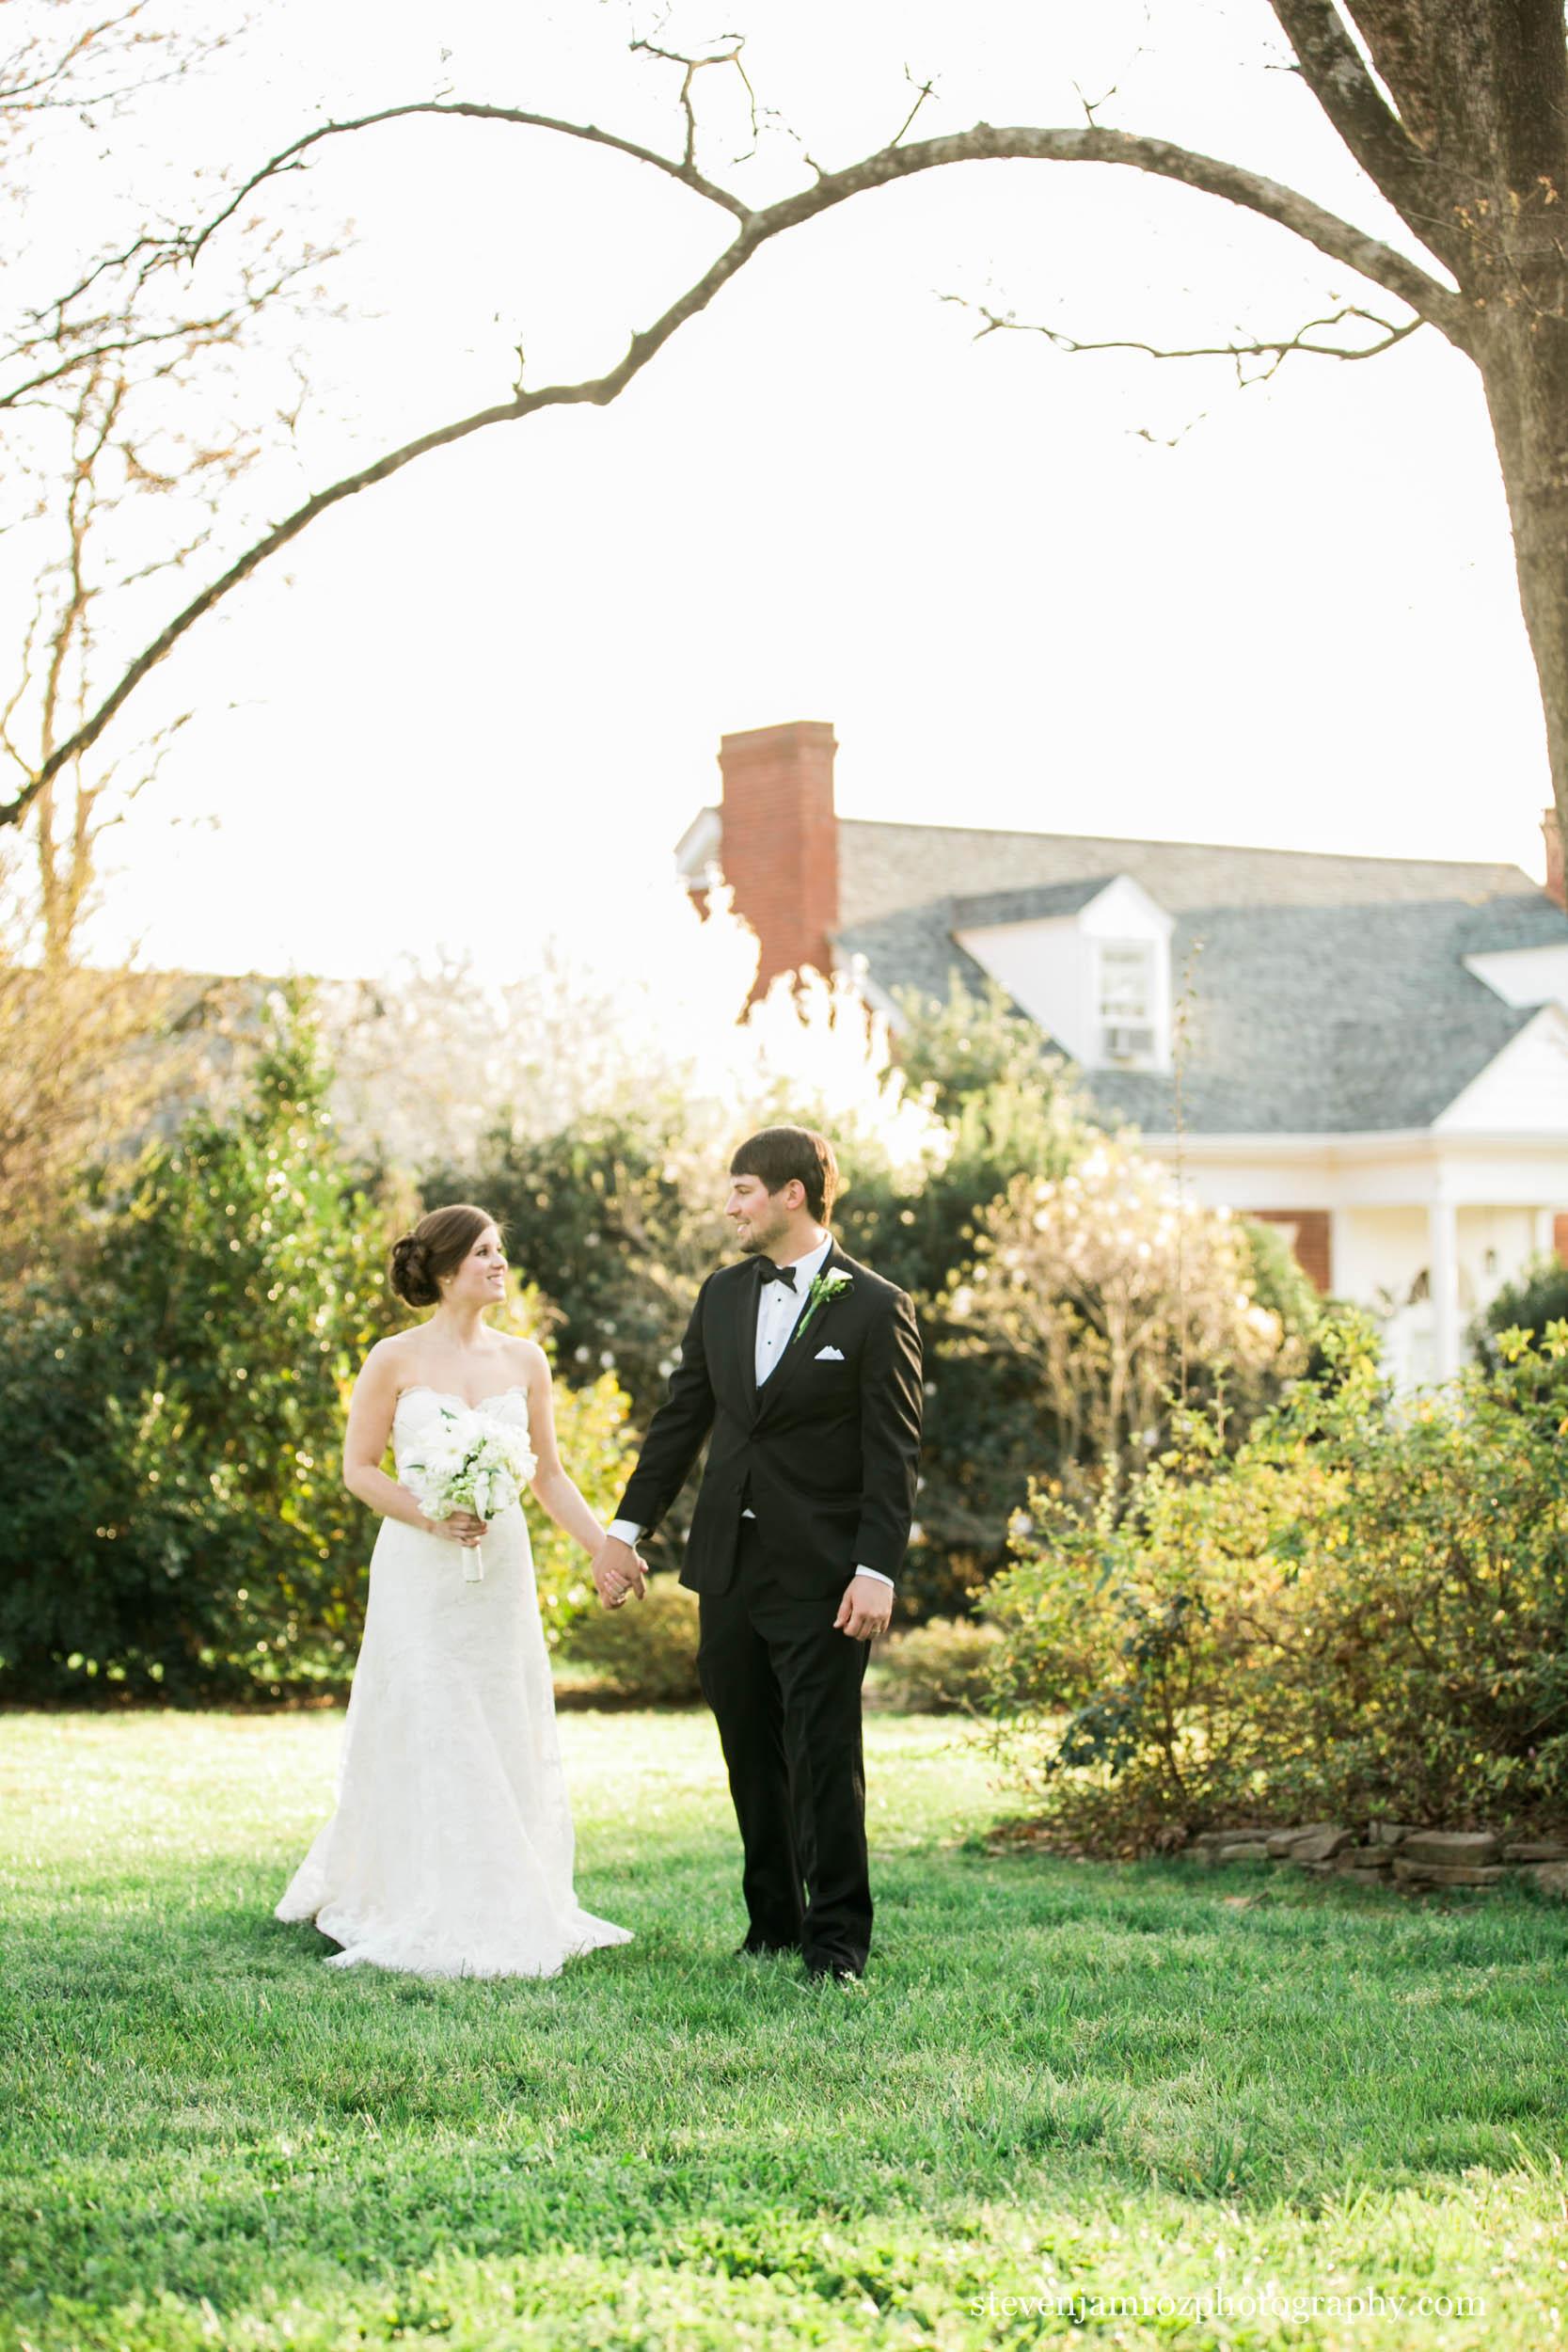 holding-hands-jones-chapel-wedding-raleigh-nc-meredith-0821.jpg